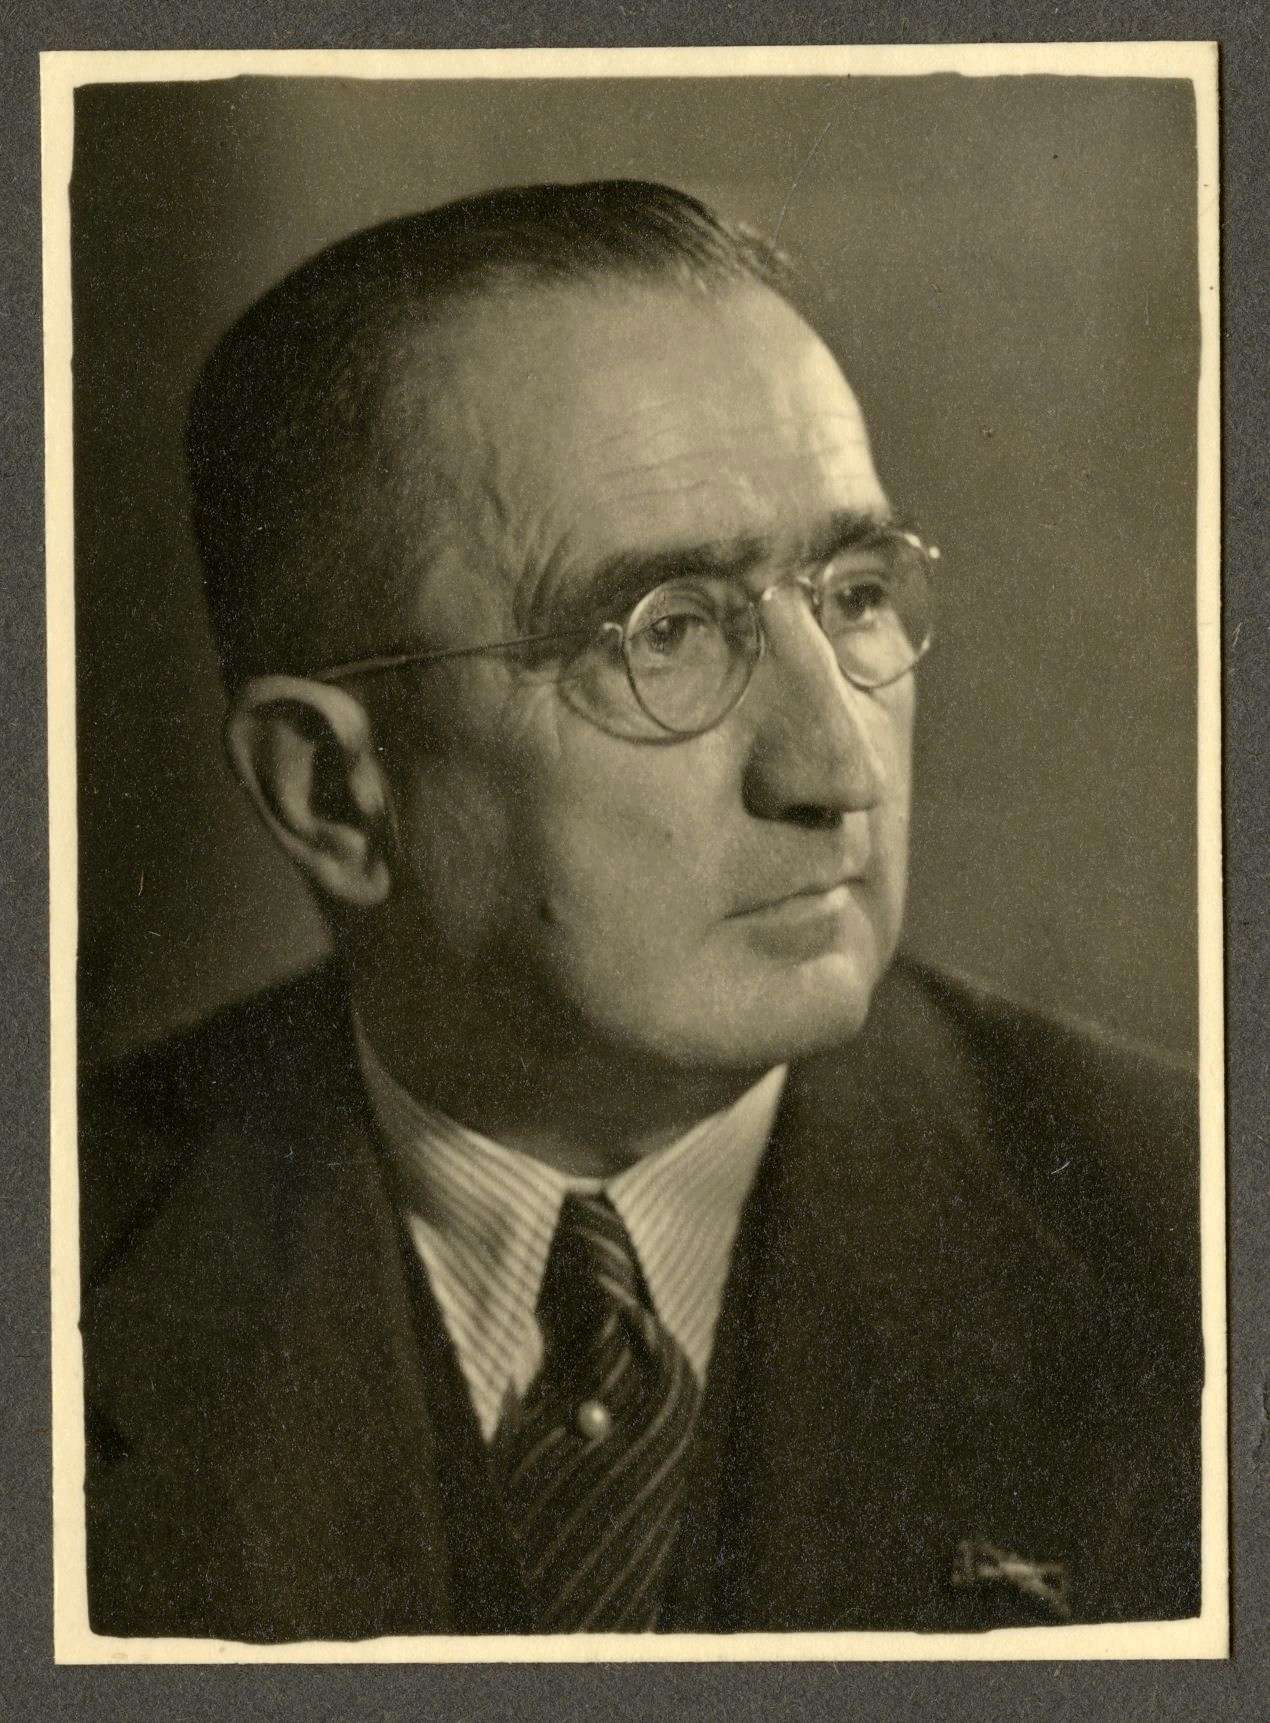 Safft, Richard, Bild 1